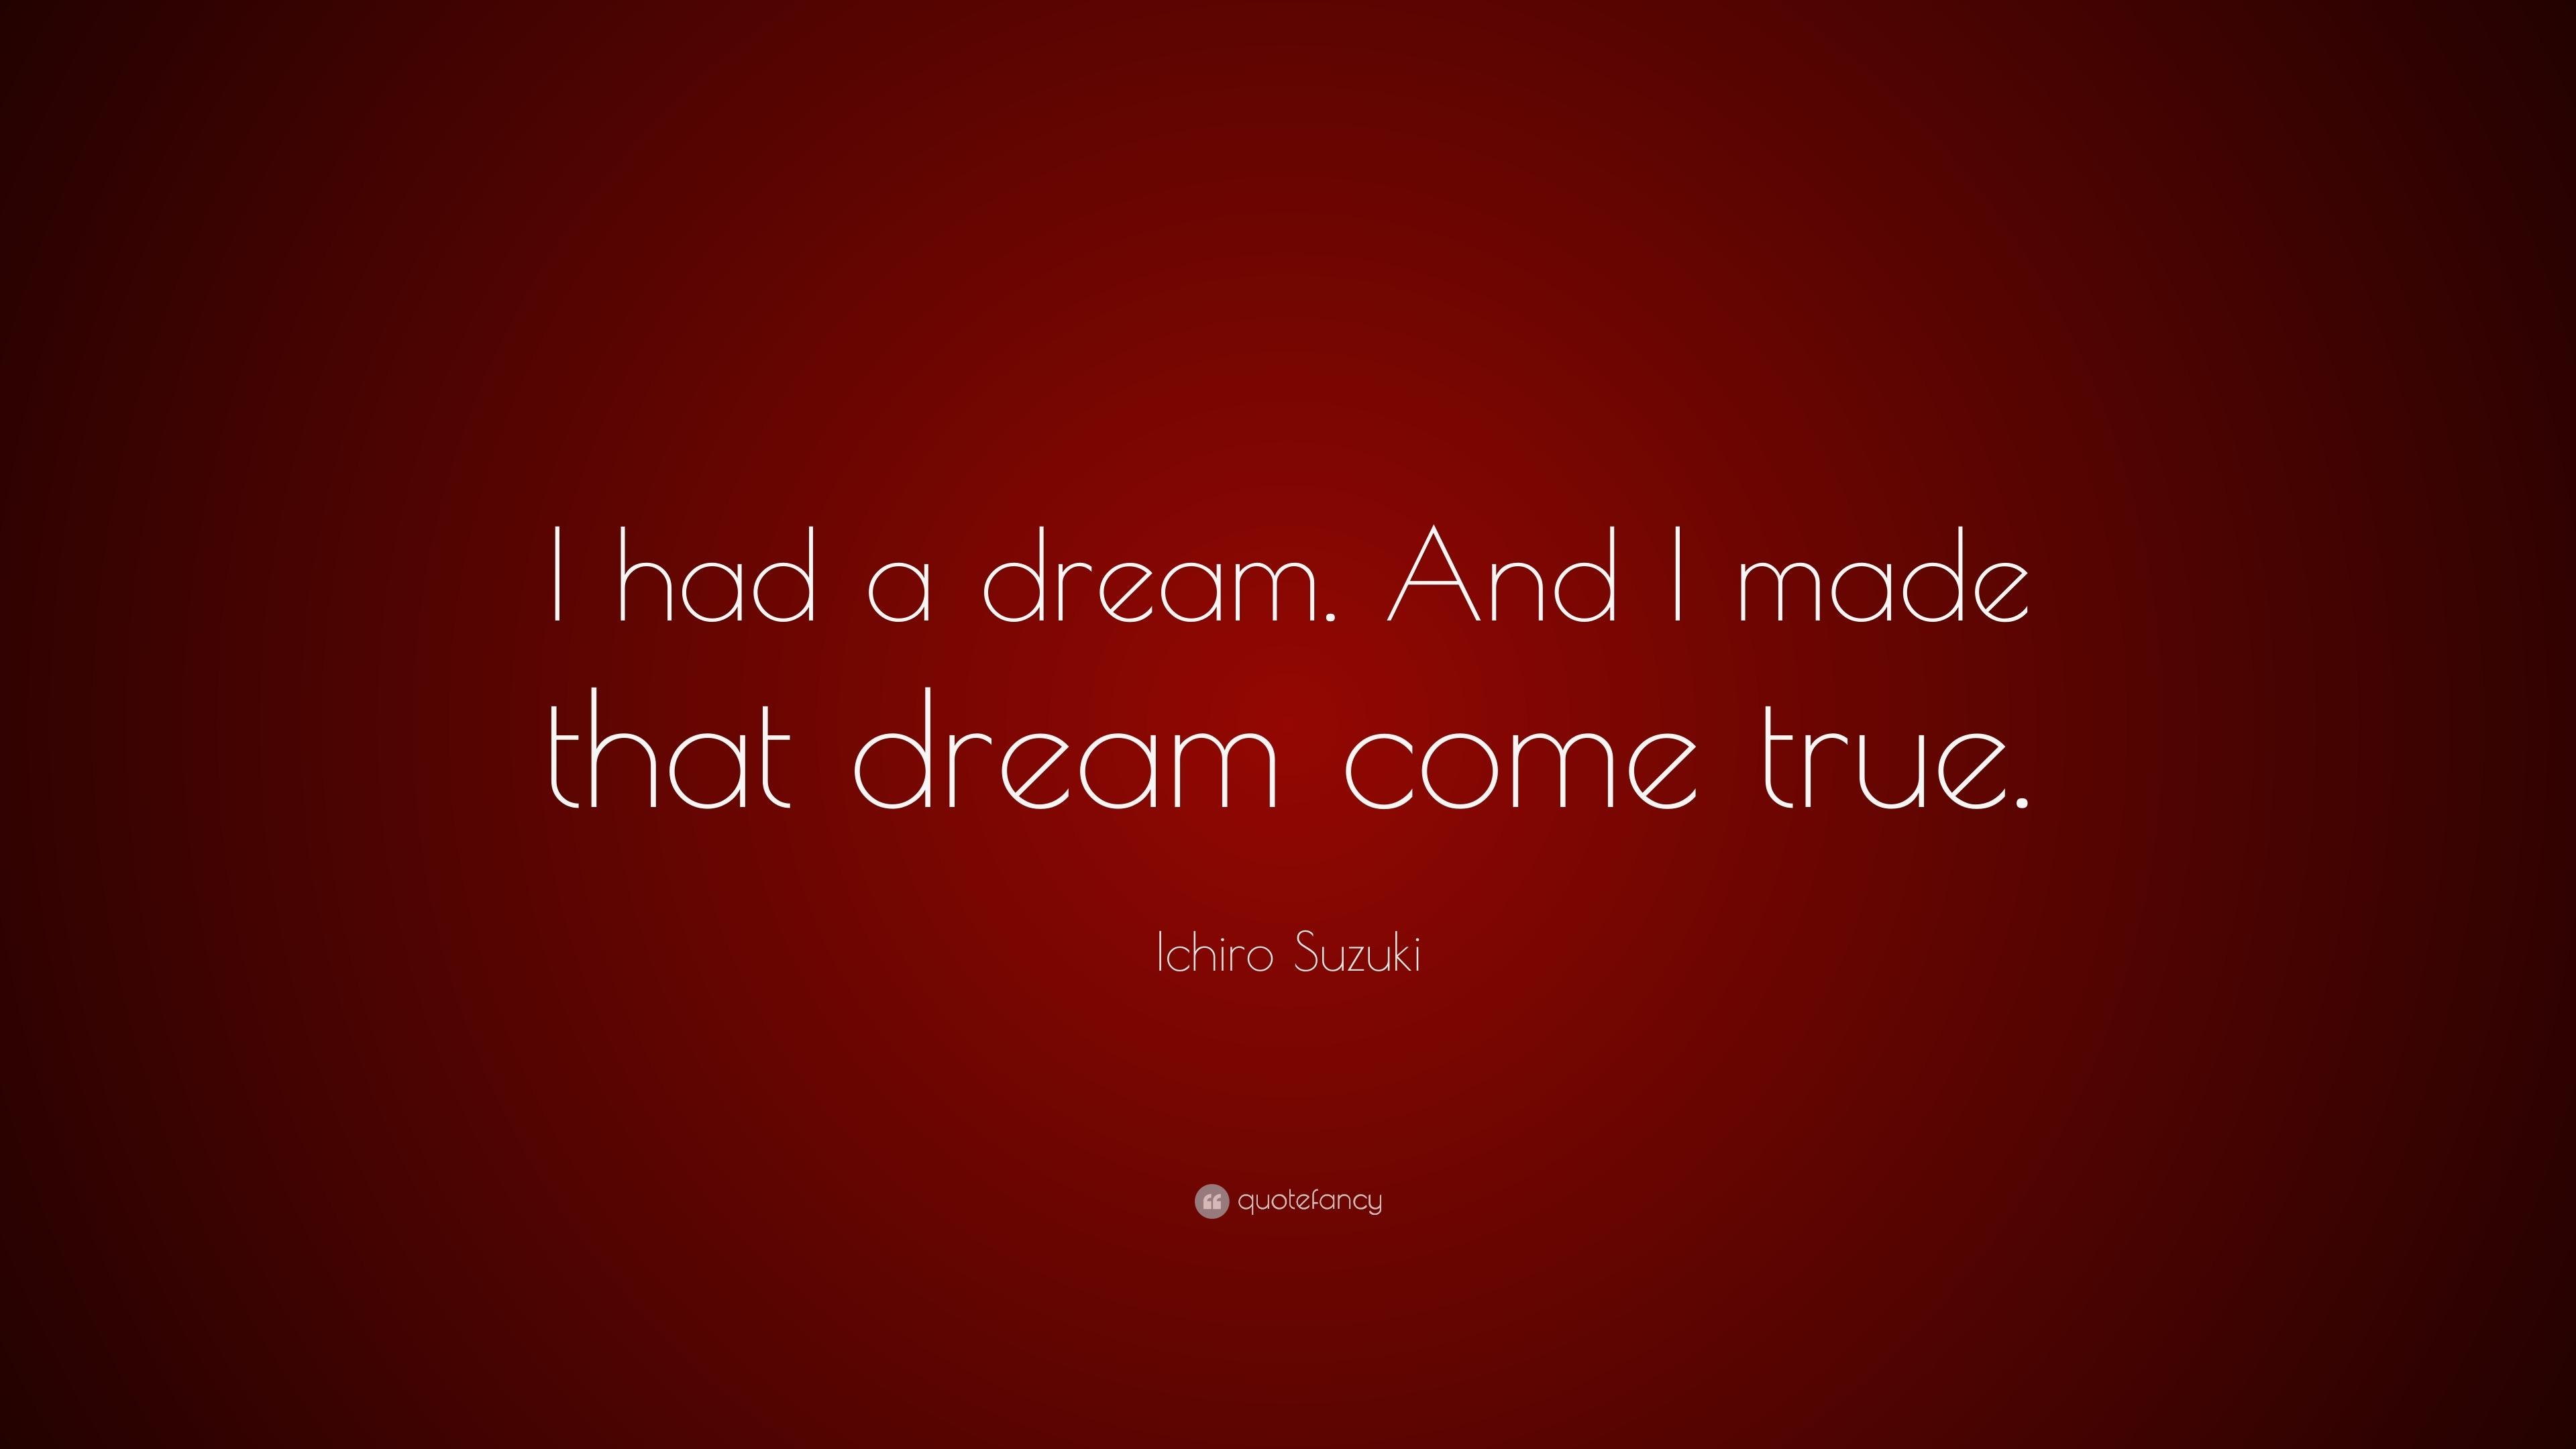 Ichiro Suzuki Quotes (22 wallpapers) - Quotefancy